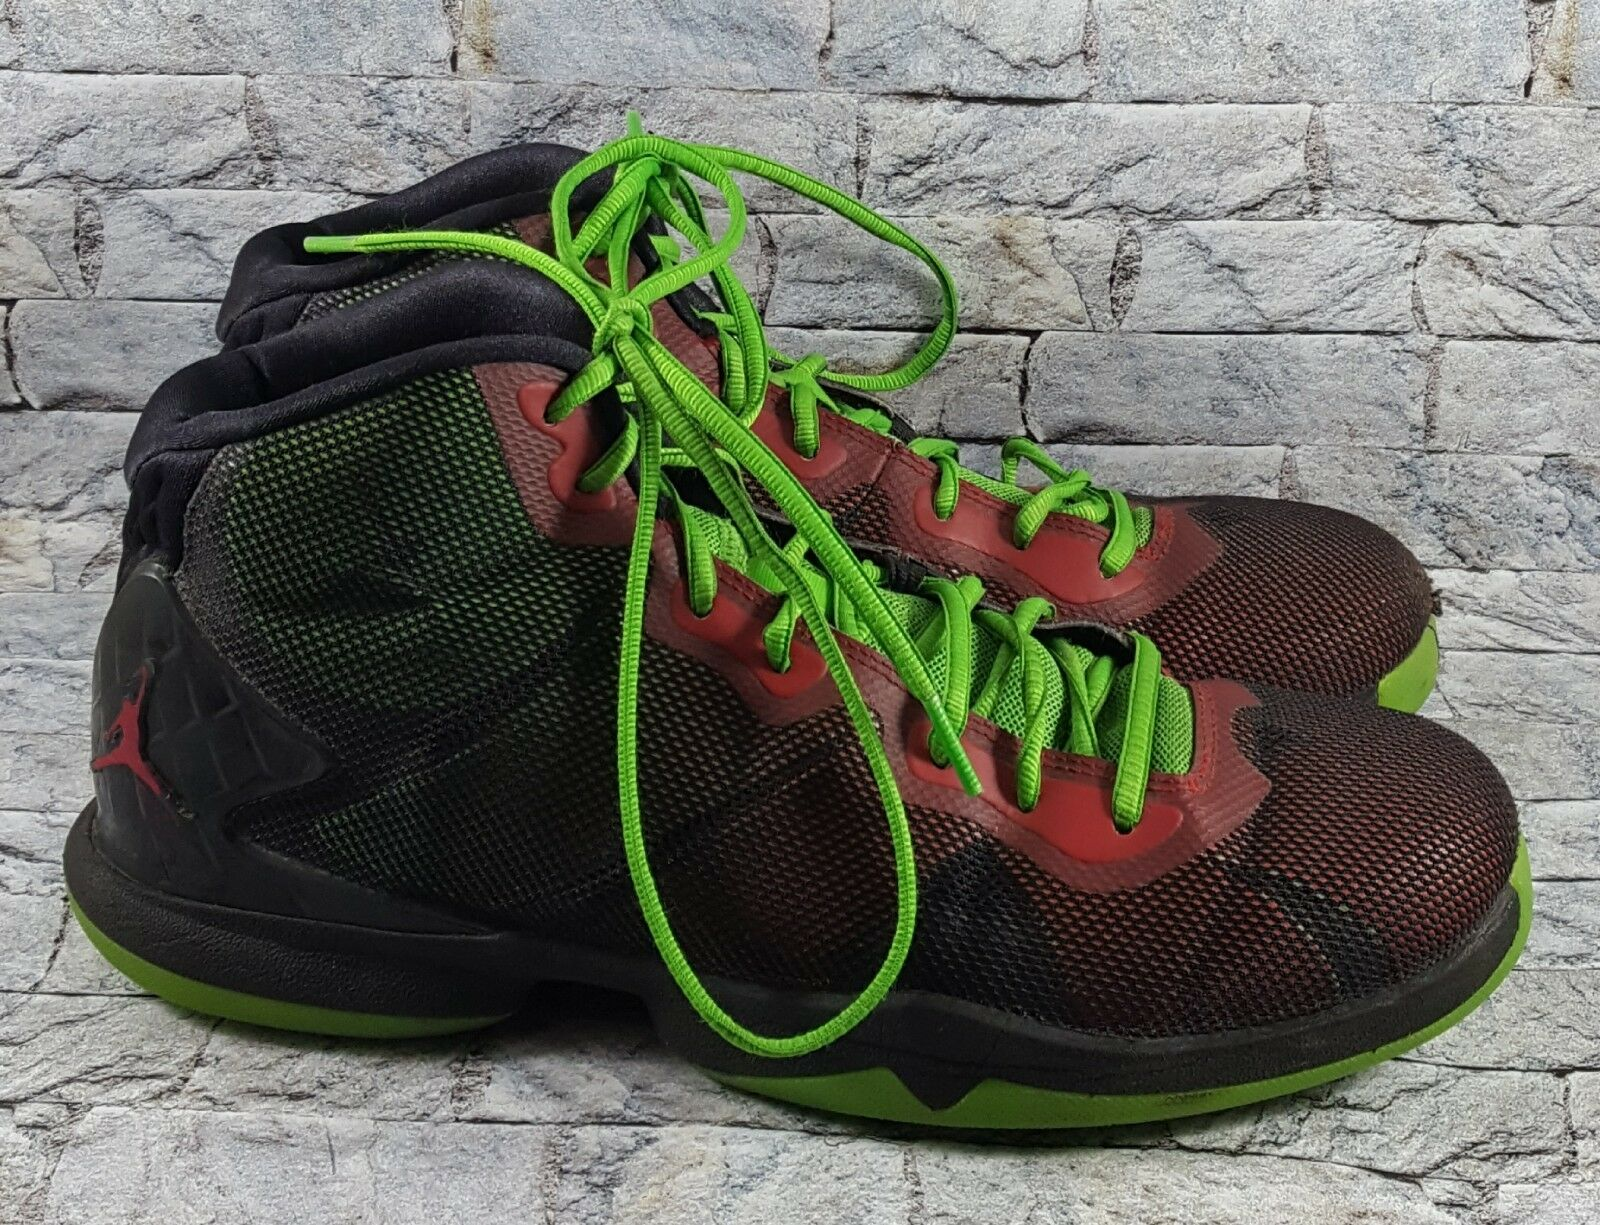 Air jordan superfly scarpe 4 uomini 768929-006 nero / verde / rosso, scarpe superfly da basket dimensioni 9.5 a40dfd